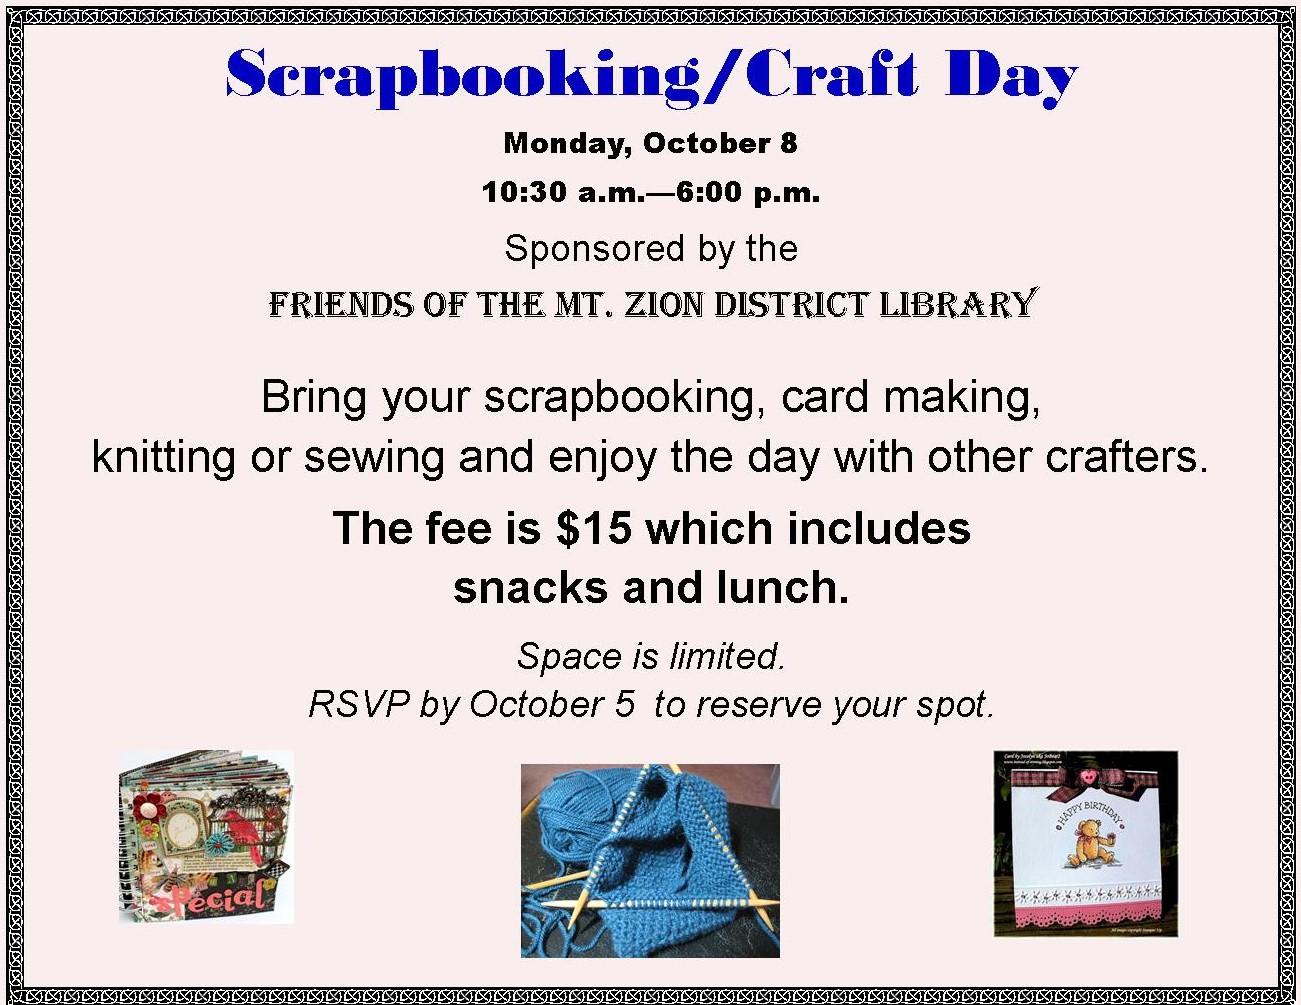 October 2018 Scrapbooking - craft day October 8 2018 smaller for Board.jpg